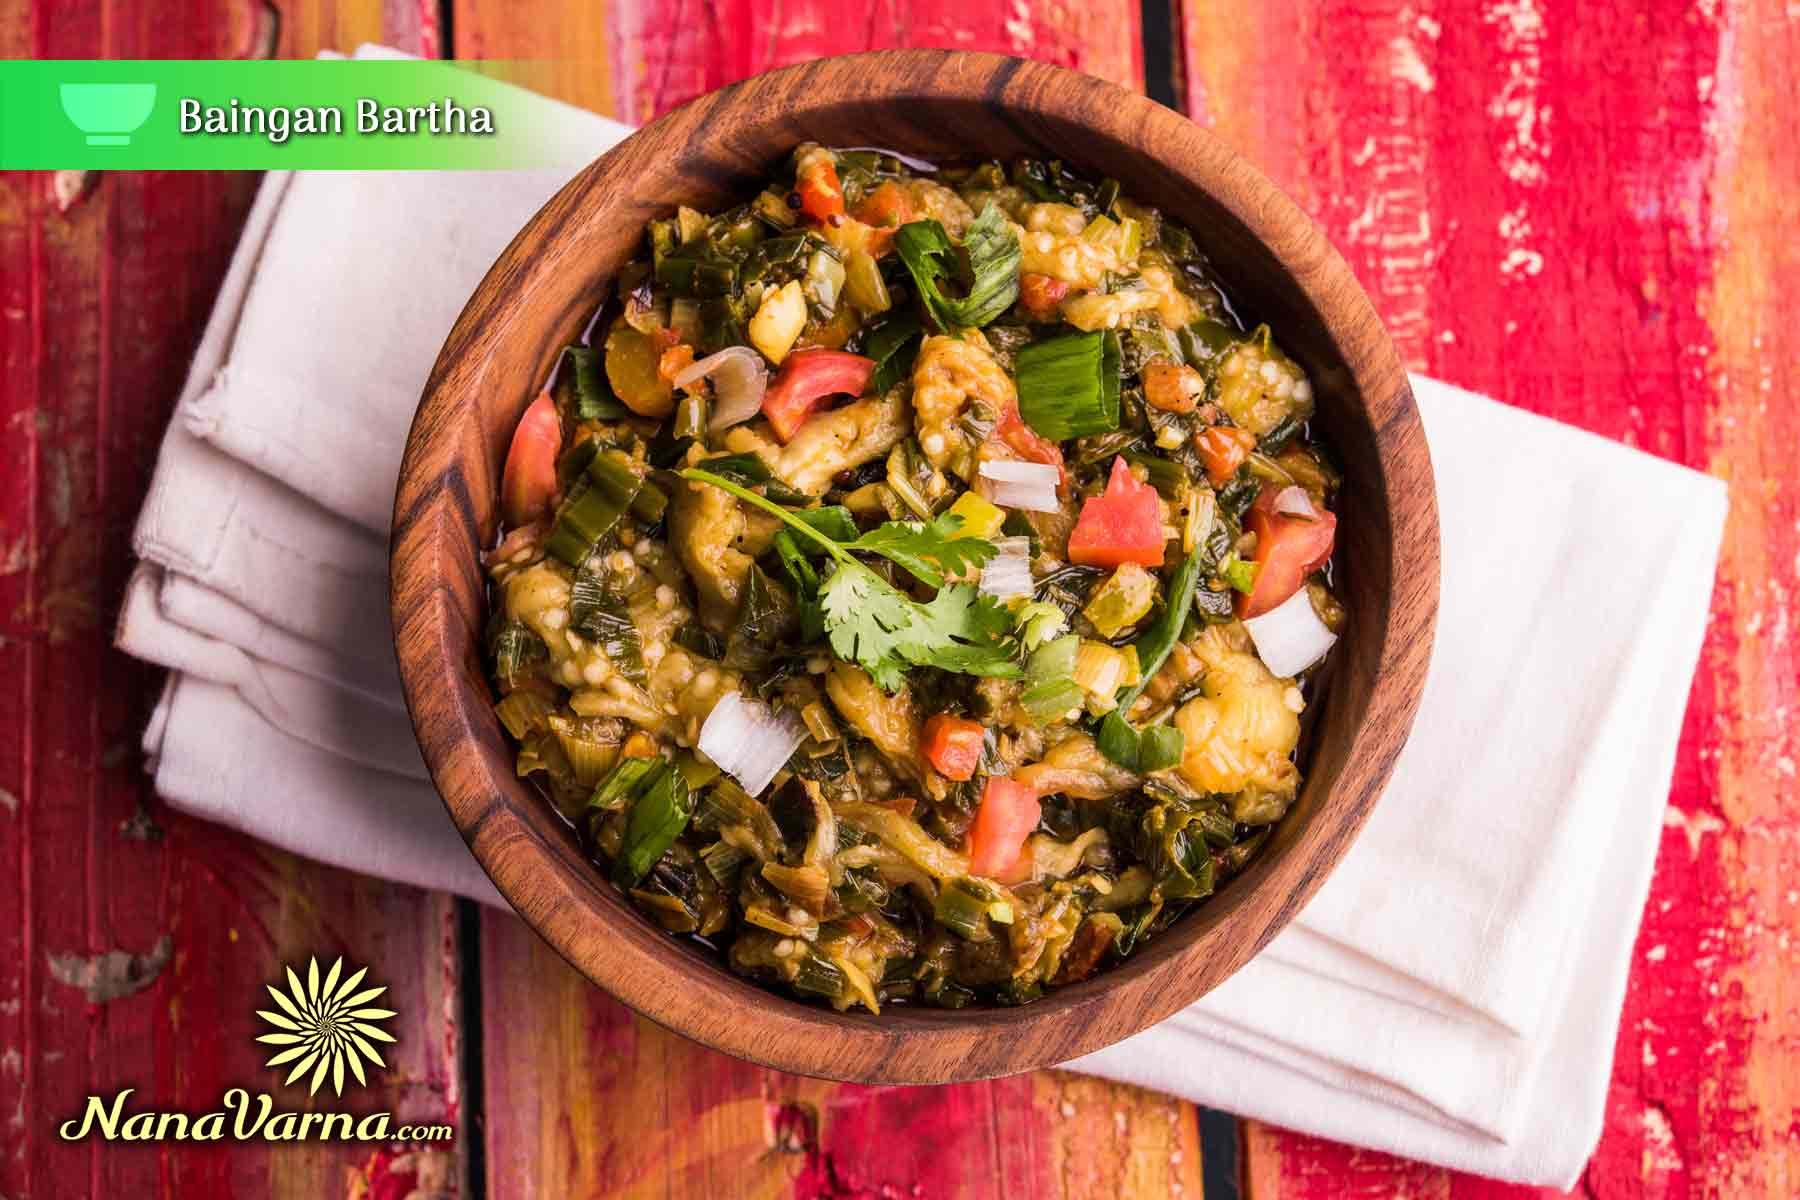 Healthy Indian Food 20